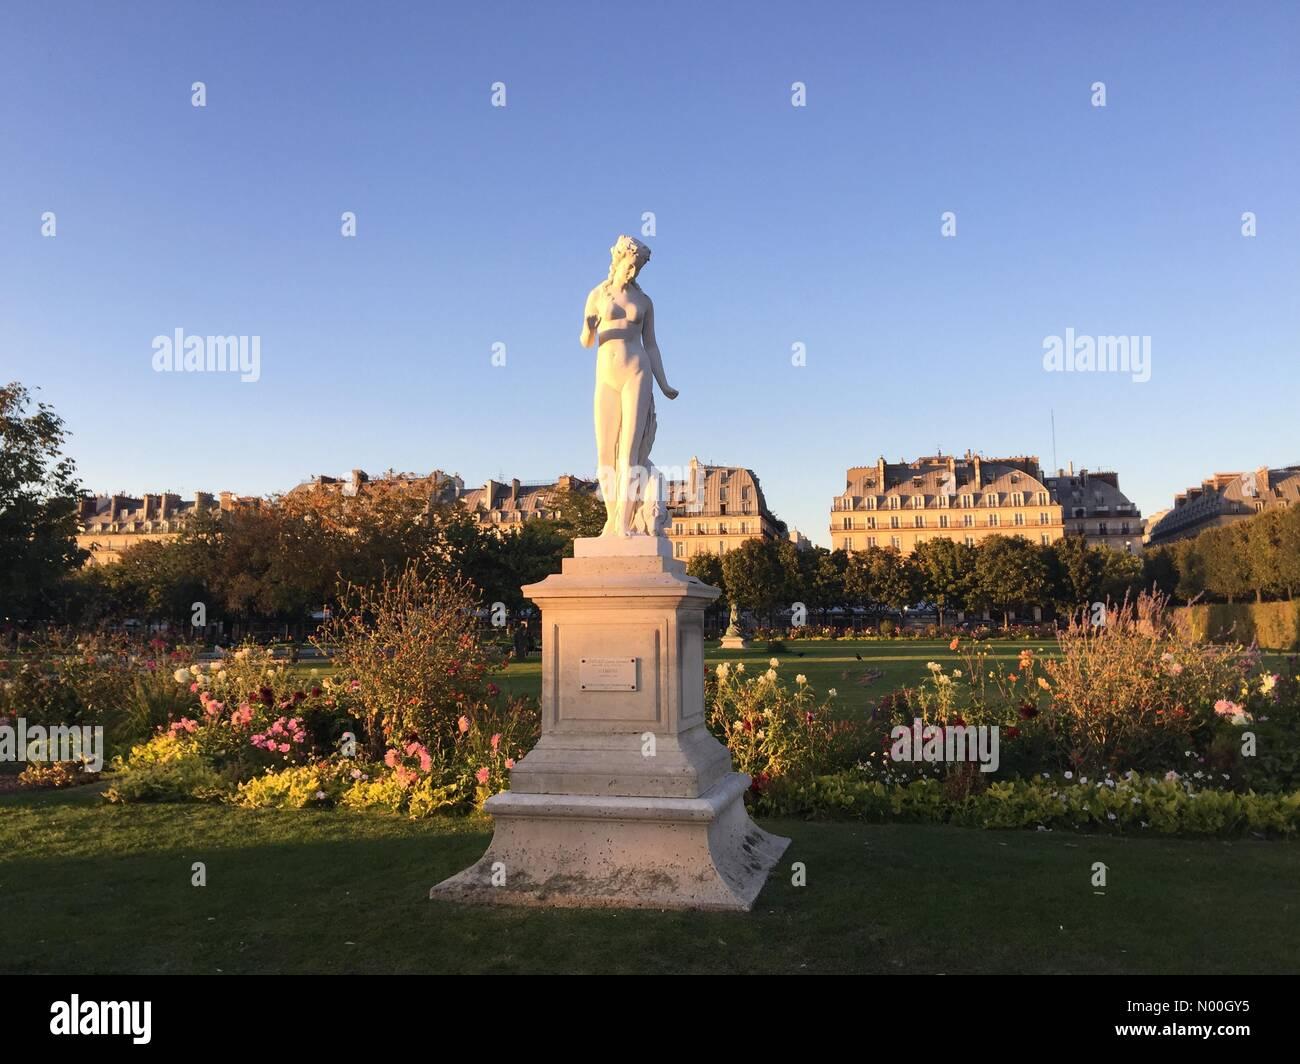 75001 Paris, France. 22nd Sep, 2017. Evening light in Tuileries gardens, Paris Credit: InesAmd/StockimoNews/Alamy - Stock Image